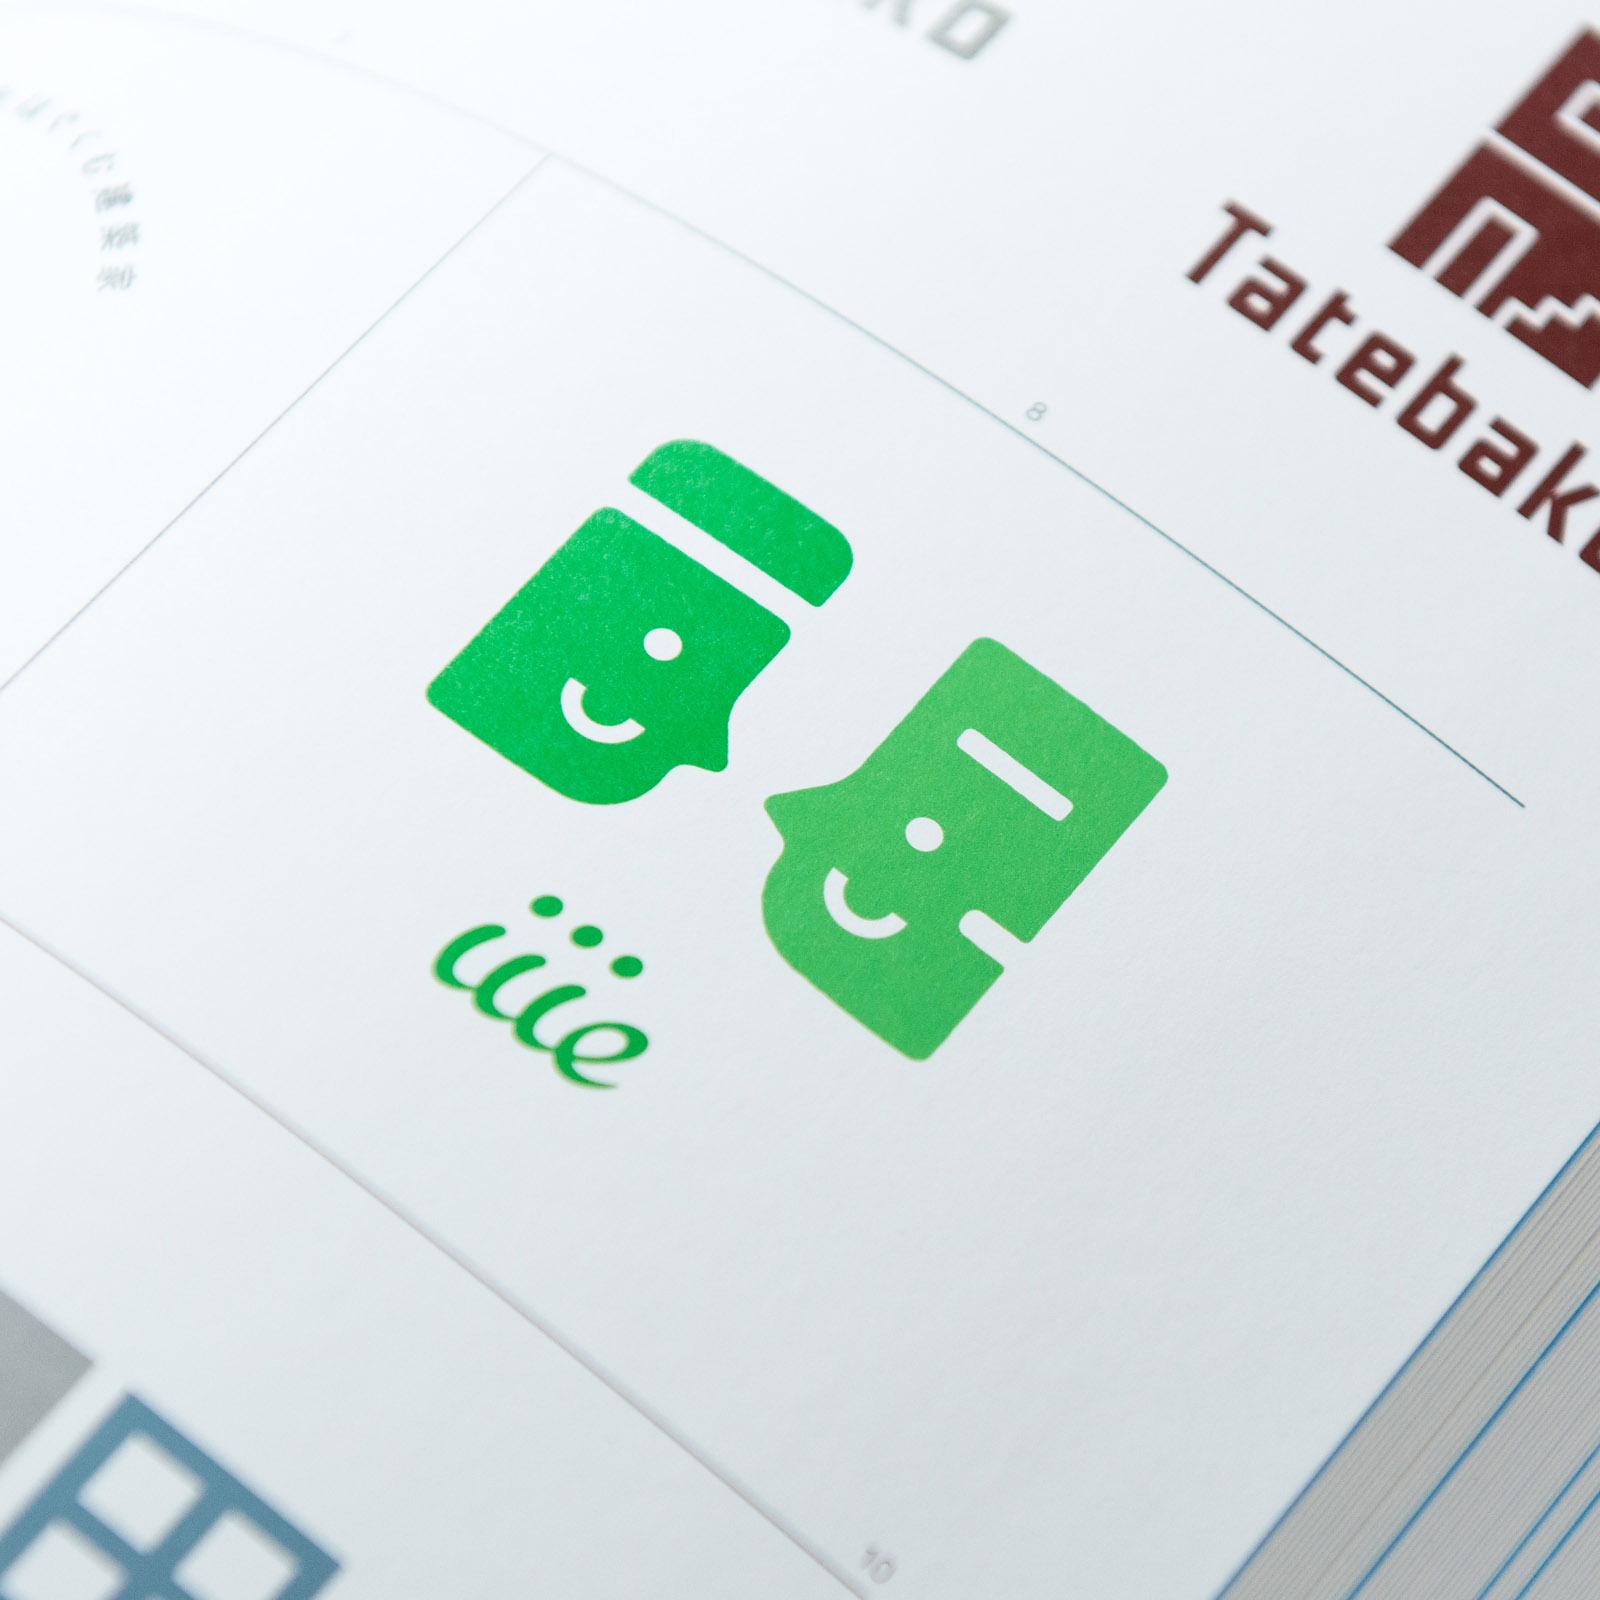 iiie(イイイエ)ロゴマーク/信頼・誠実を大切にする 業種別ロゴのデザイン